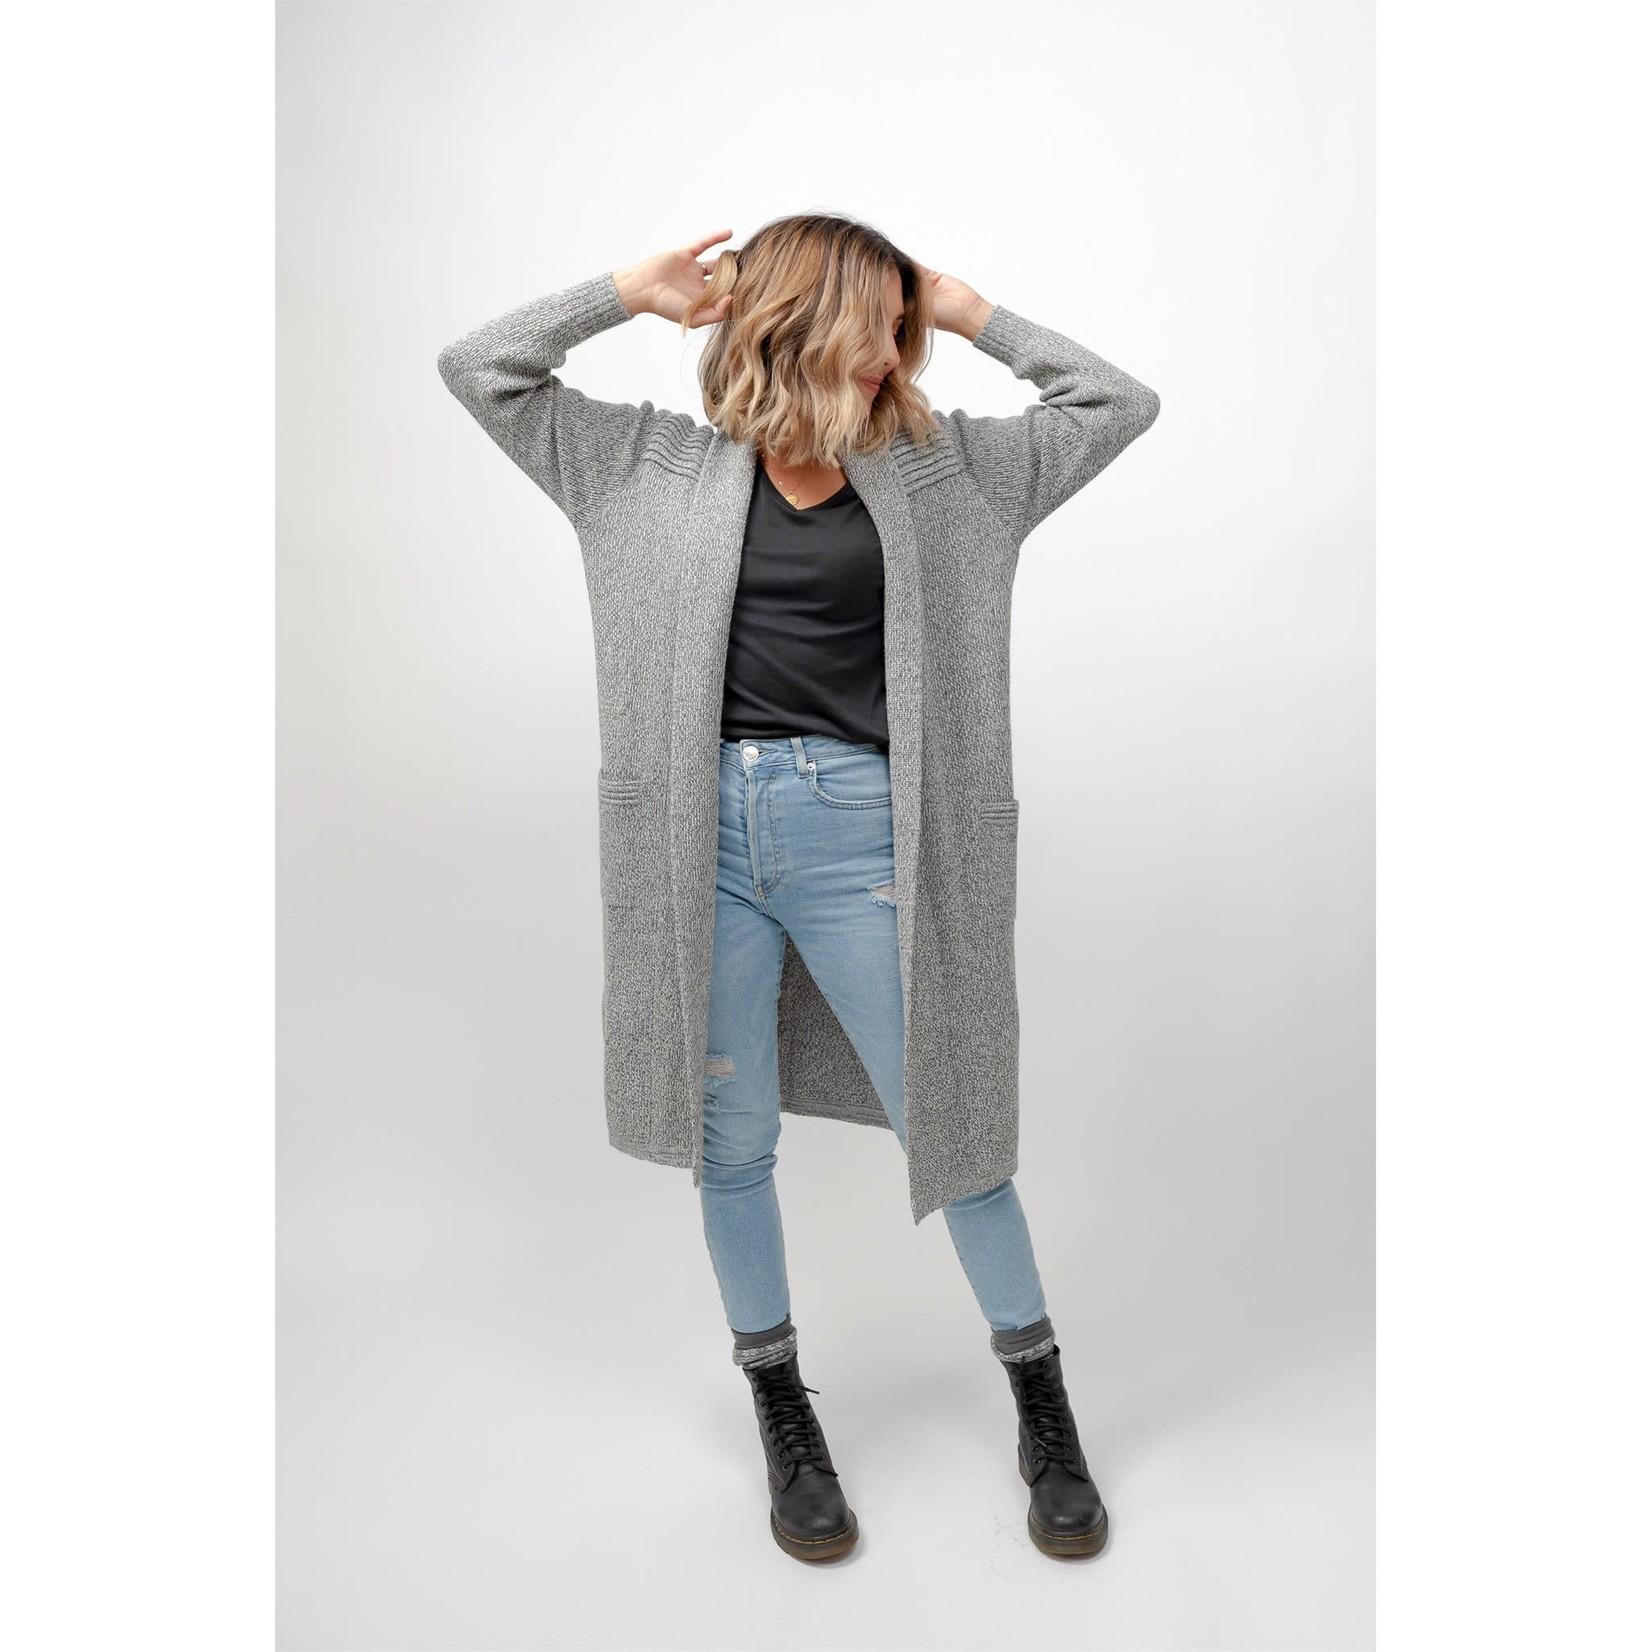 Pokoloko Alpaca Cartier Sweater Long